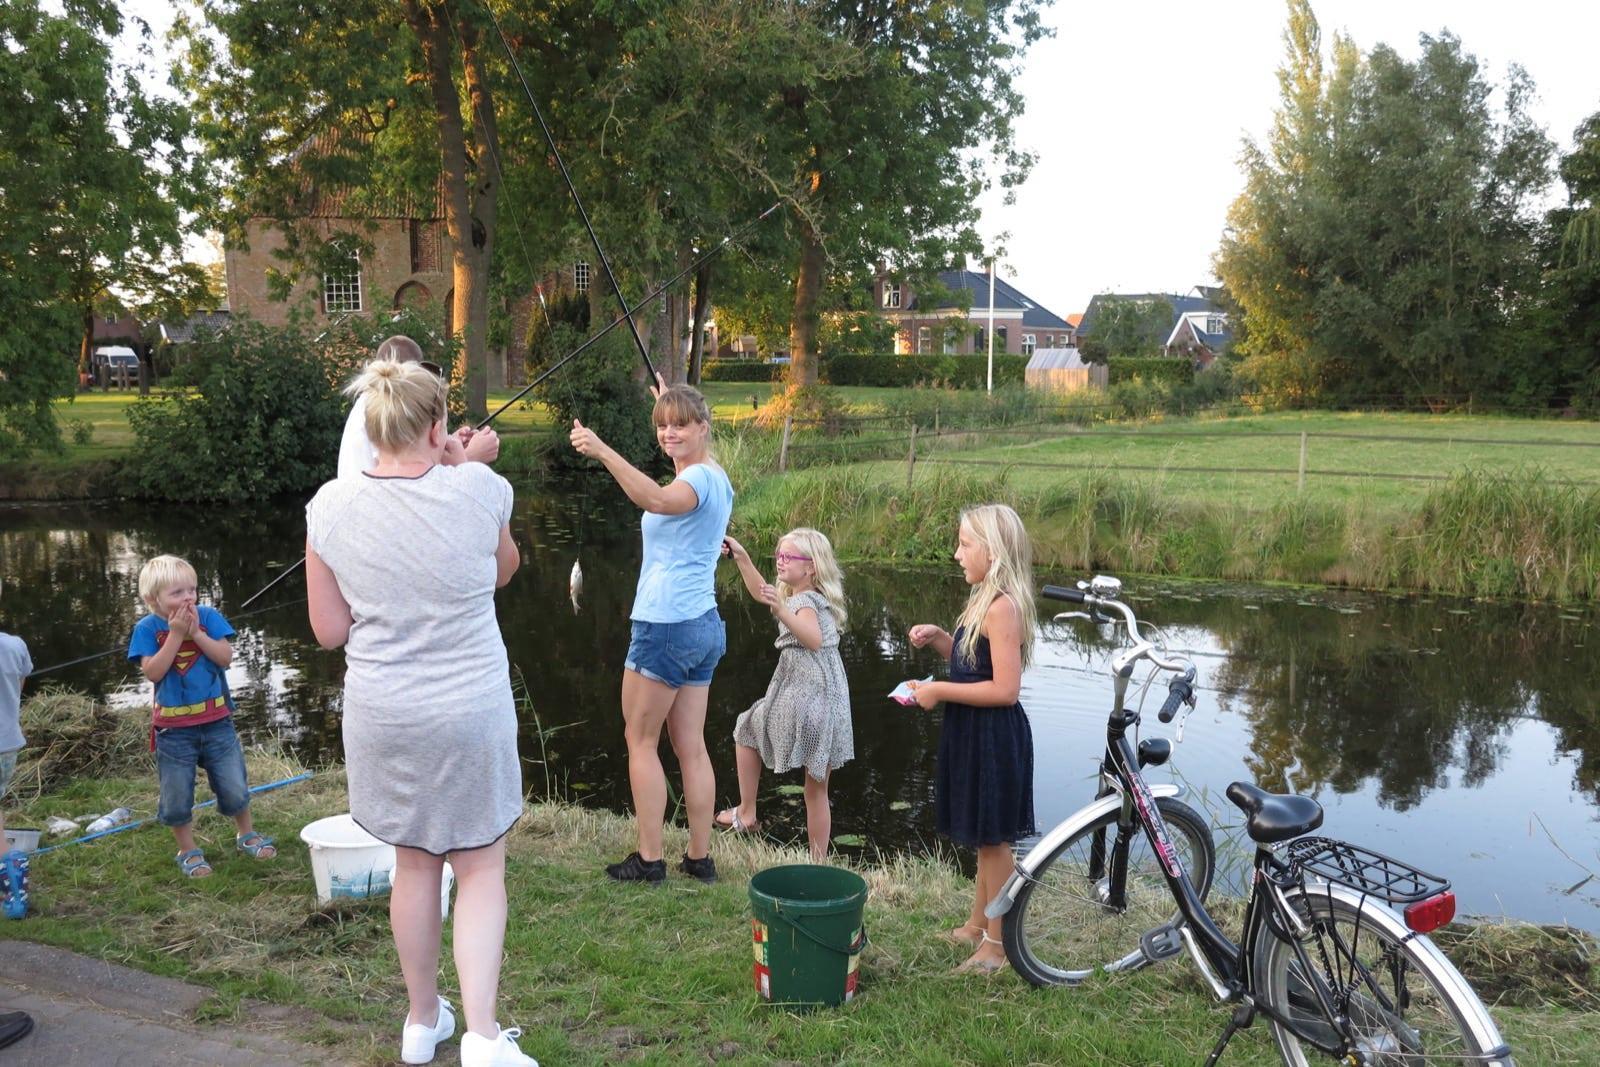 et-fiets-en-fietser-83-viswedstrijd-2016-beet!!-karin-oi.jpg